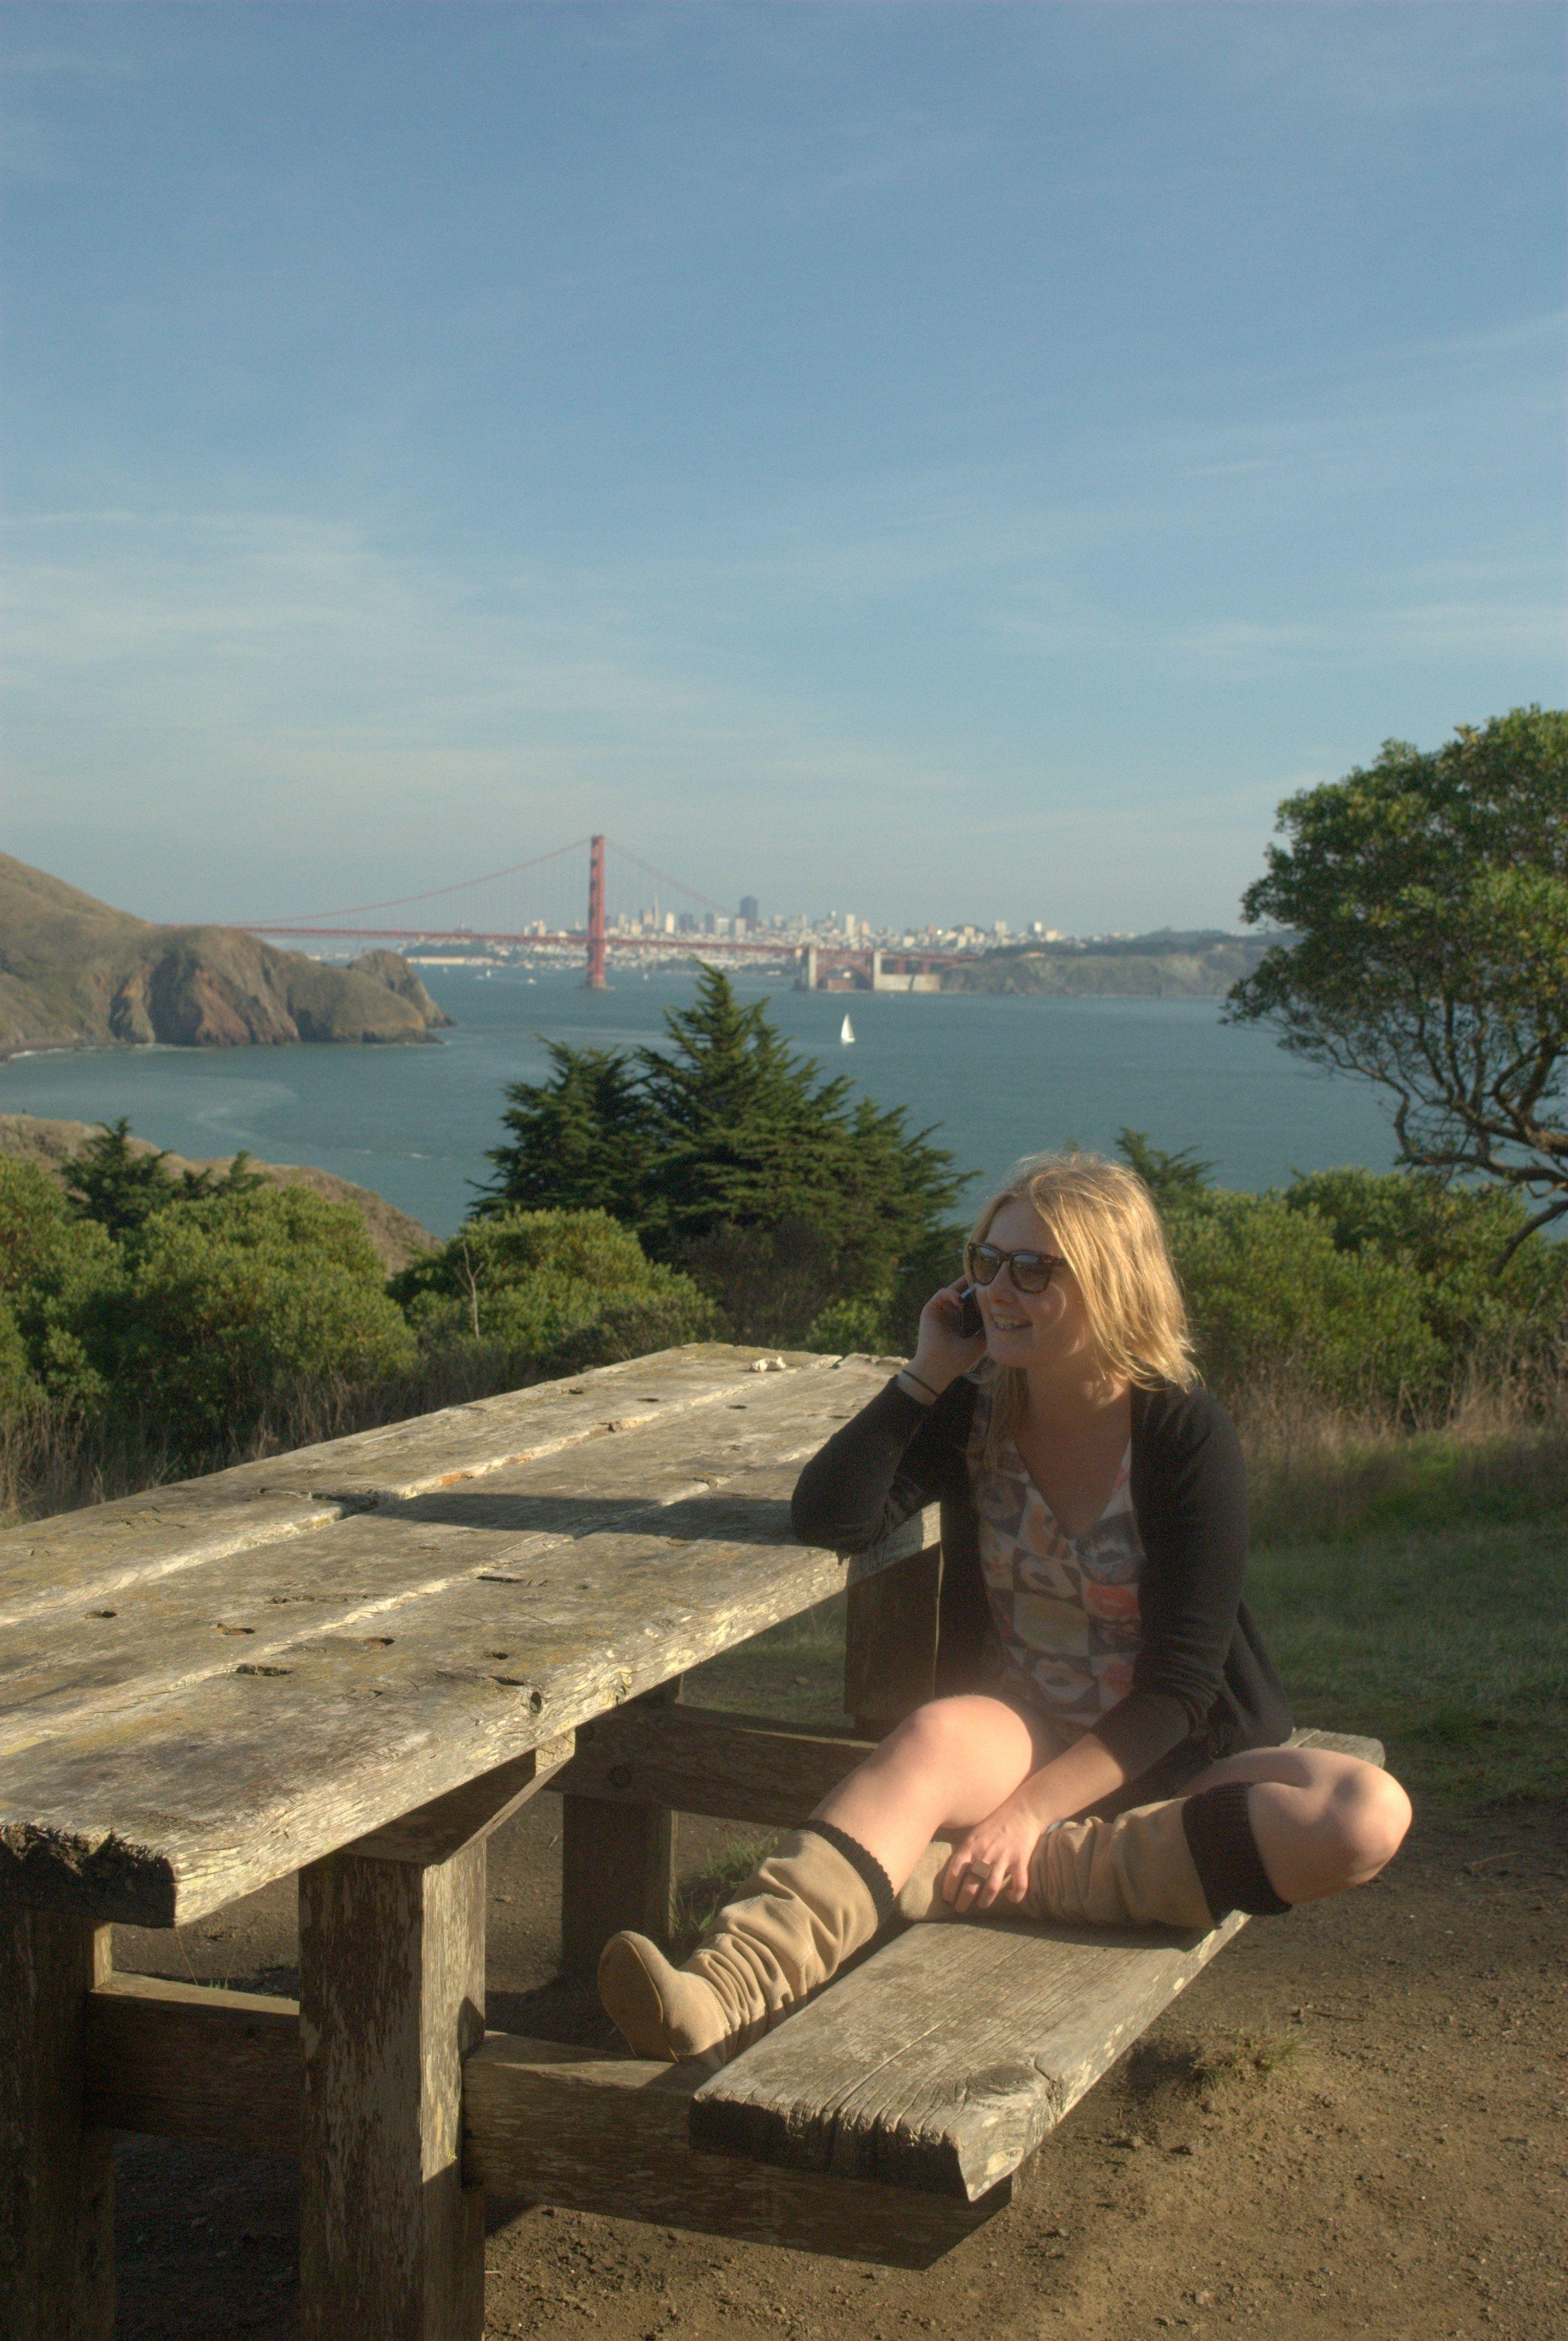 Liza - Holotropic Breathwork Circle     Welcome 🙏 (San Francisco